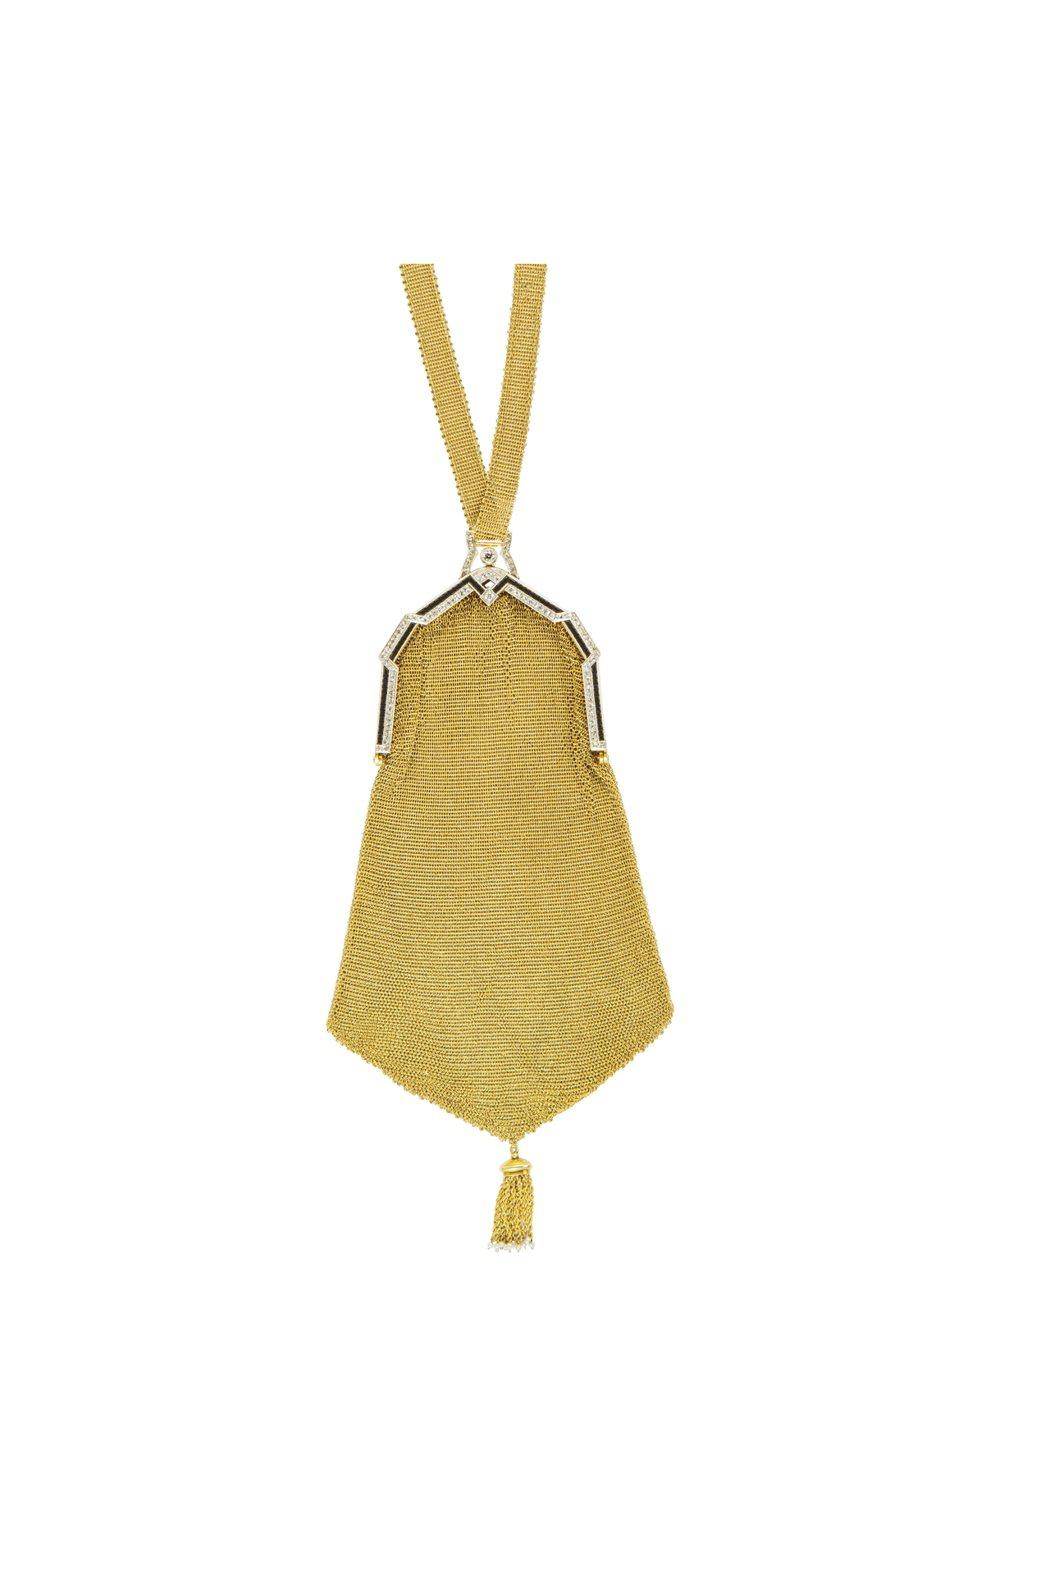 Tiffany手袋 (1925),使用黃金、鉑金、鑽石、珍珠與瑪瑙,網眼手袋在1...